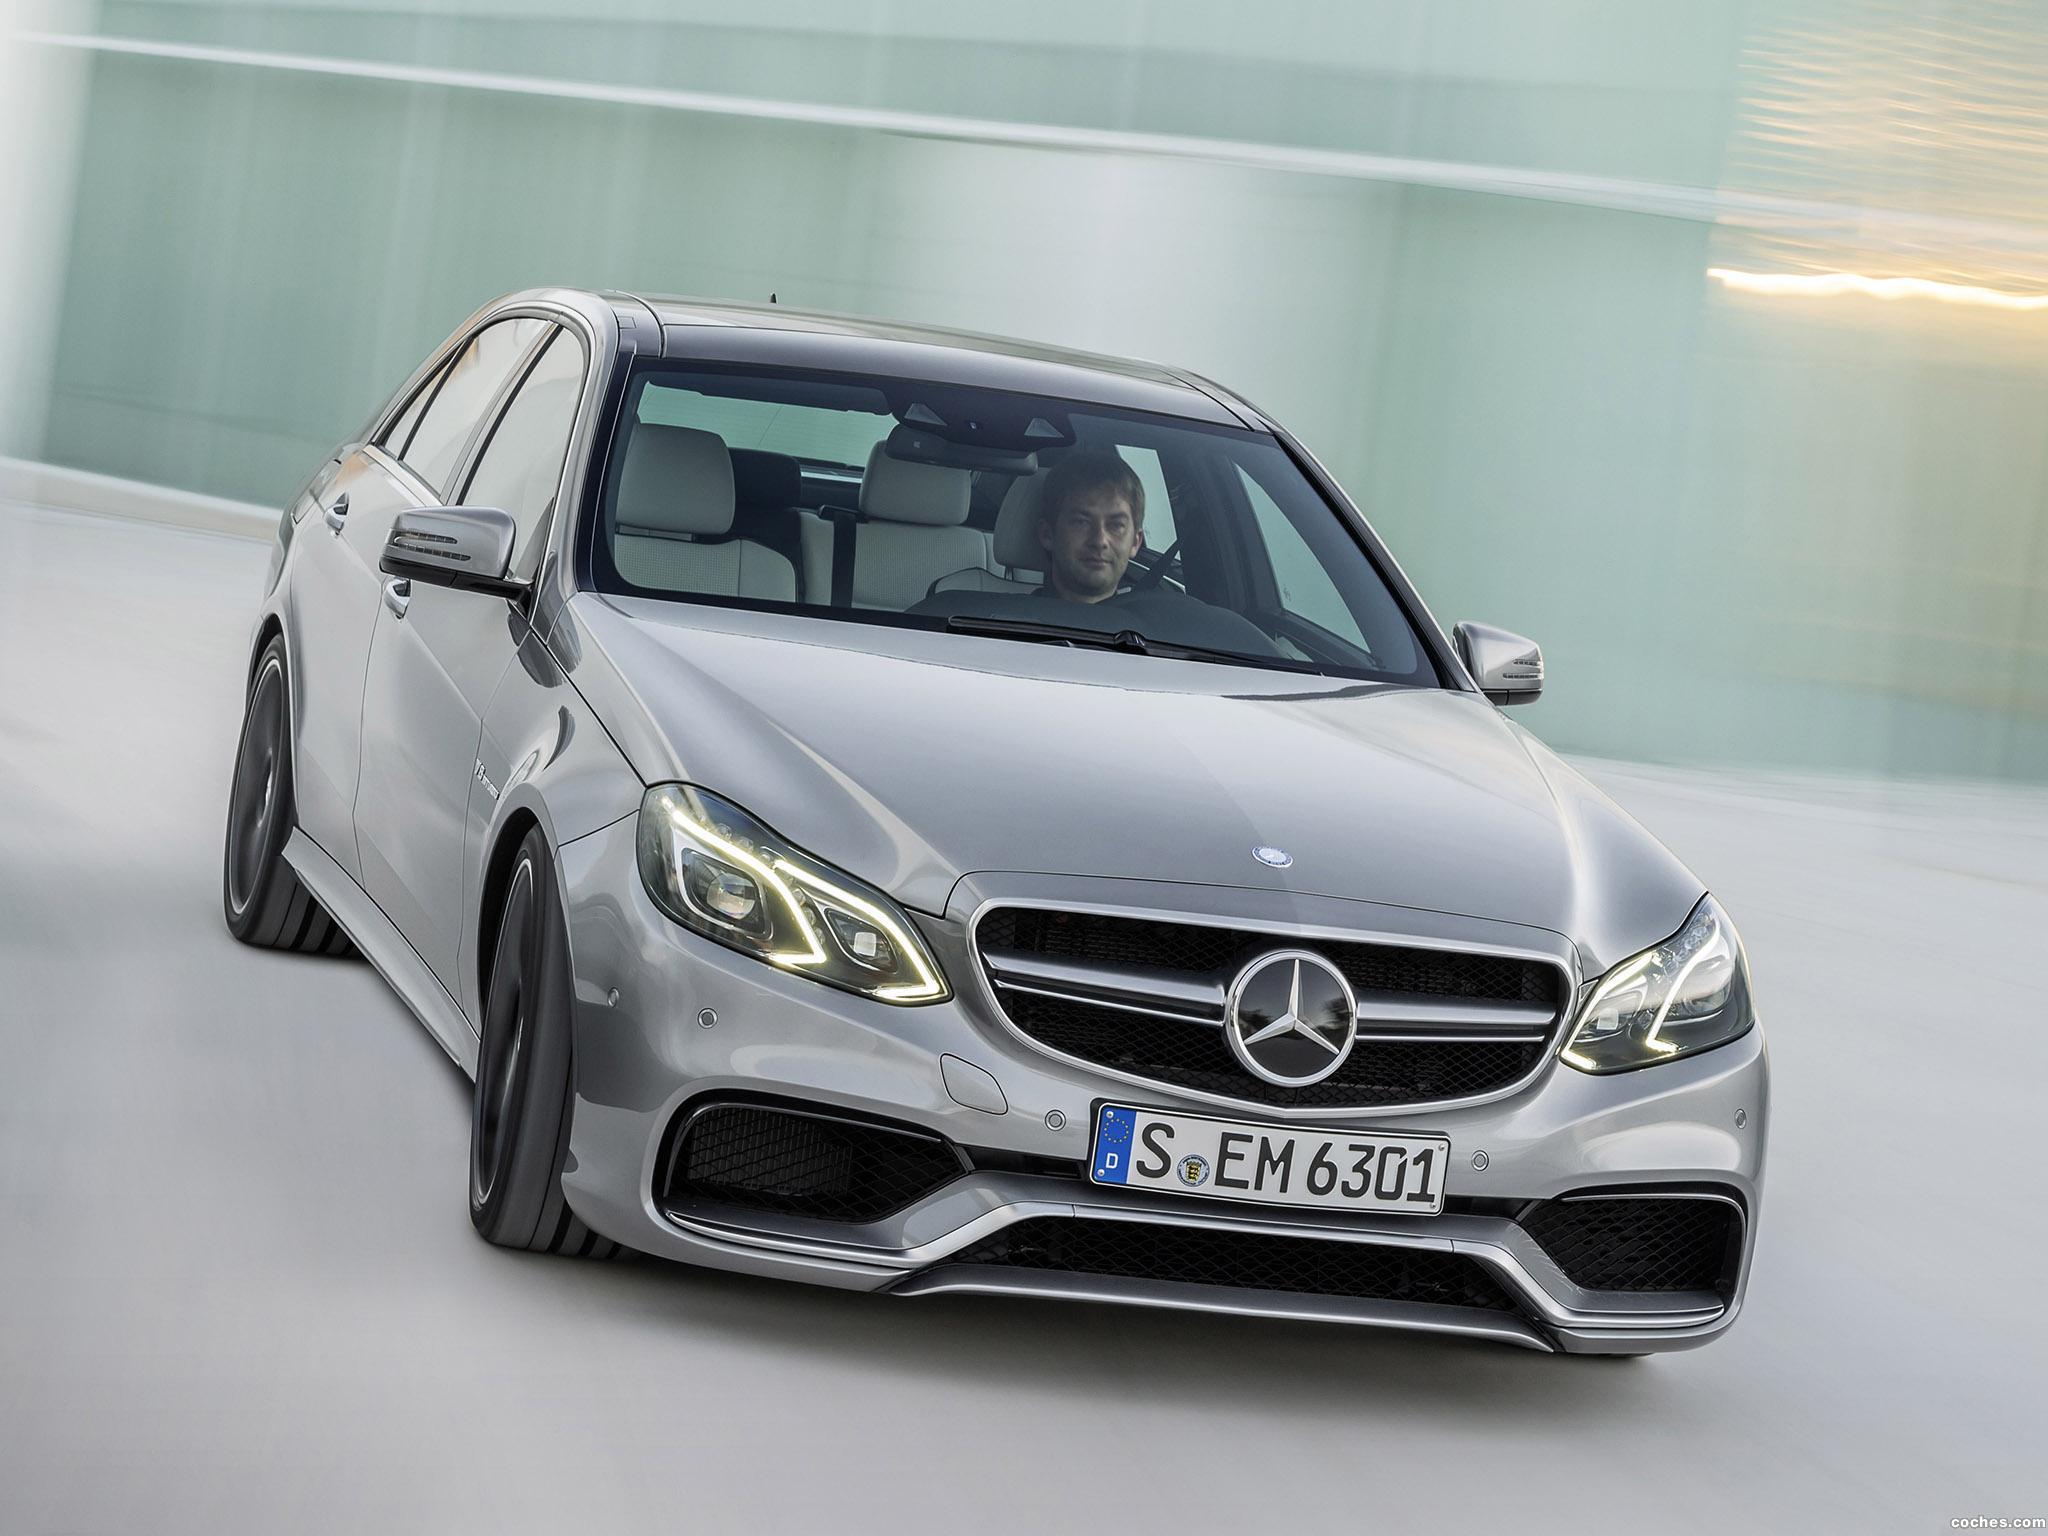 Foto 1 de Mercedes Clase E 63 AMG W212 2013